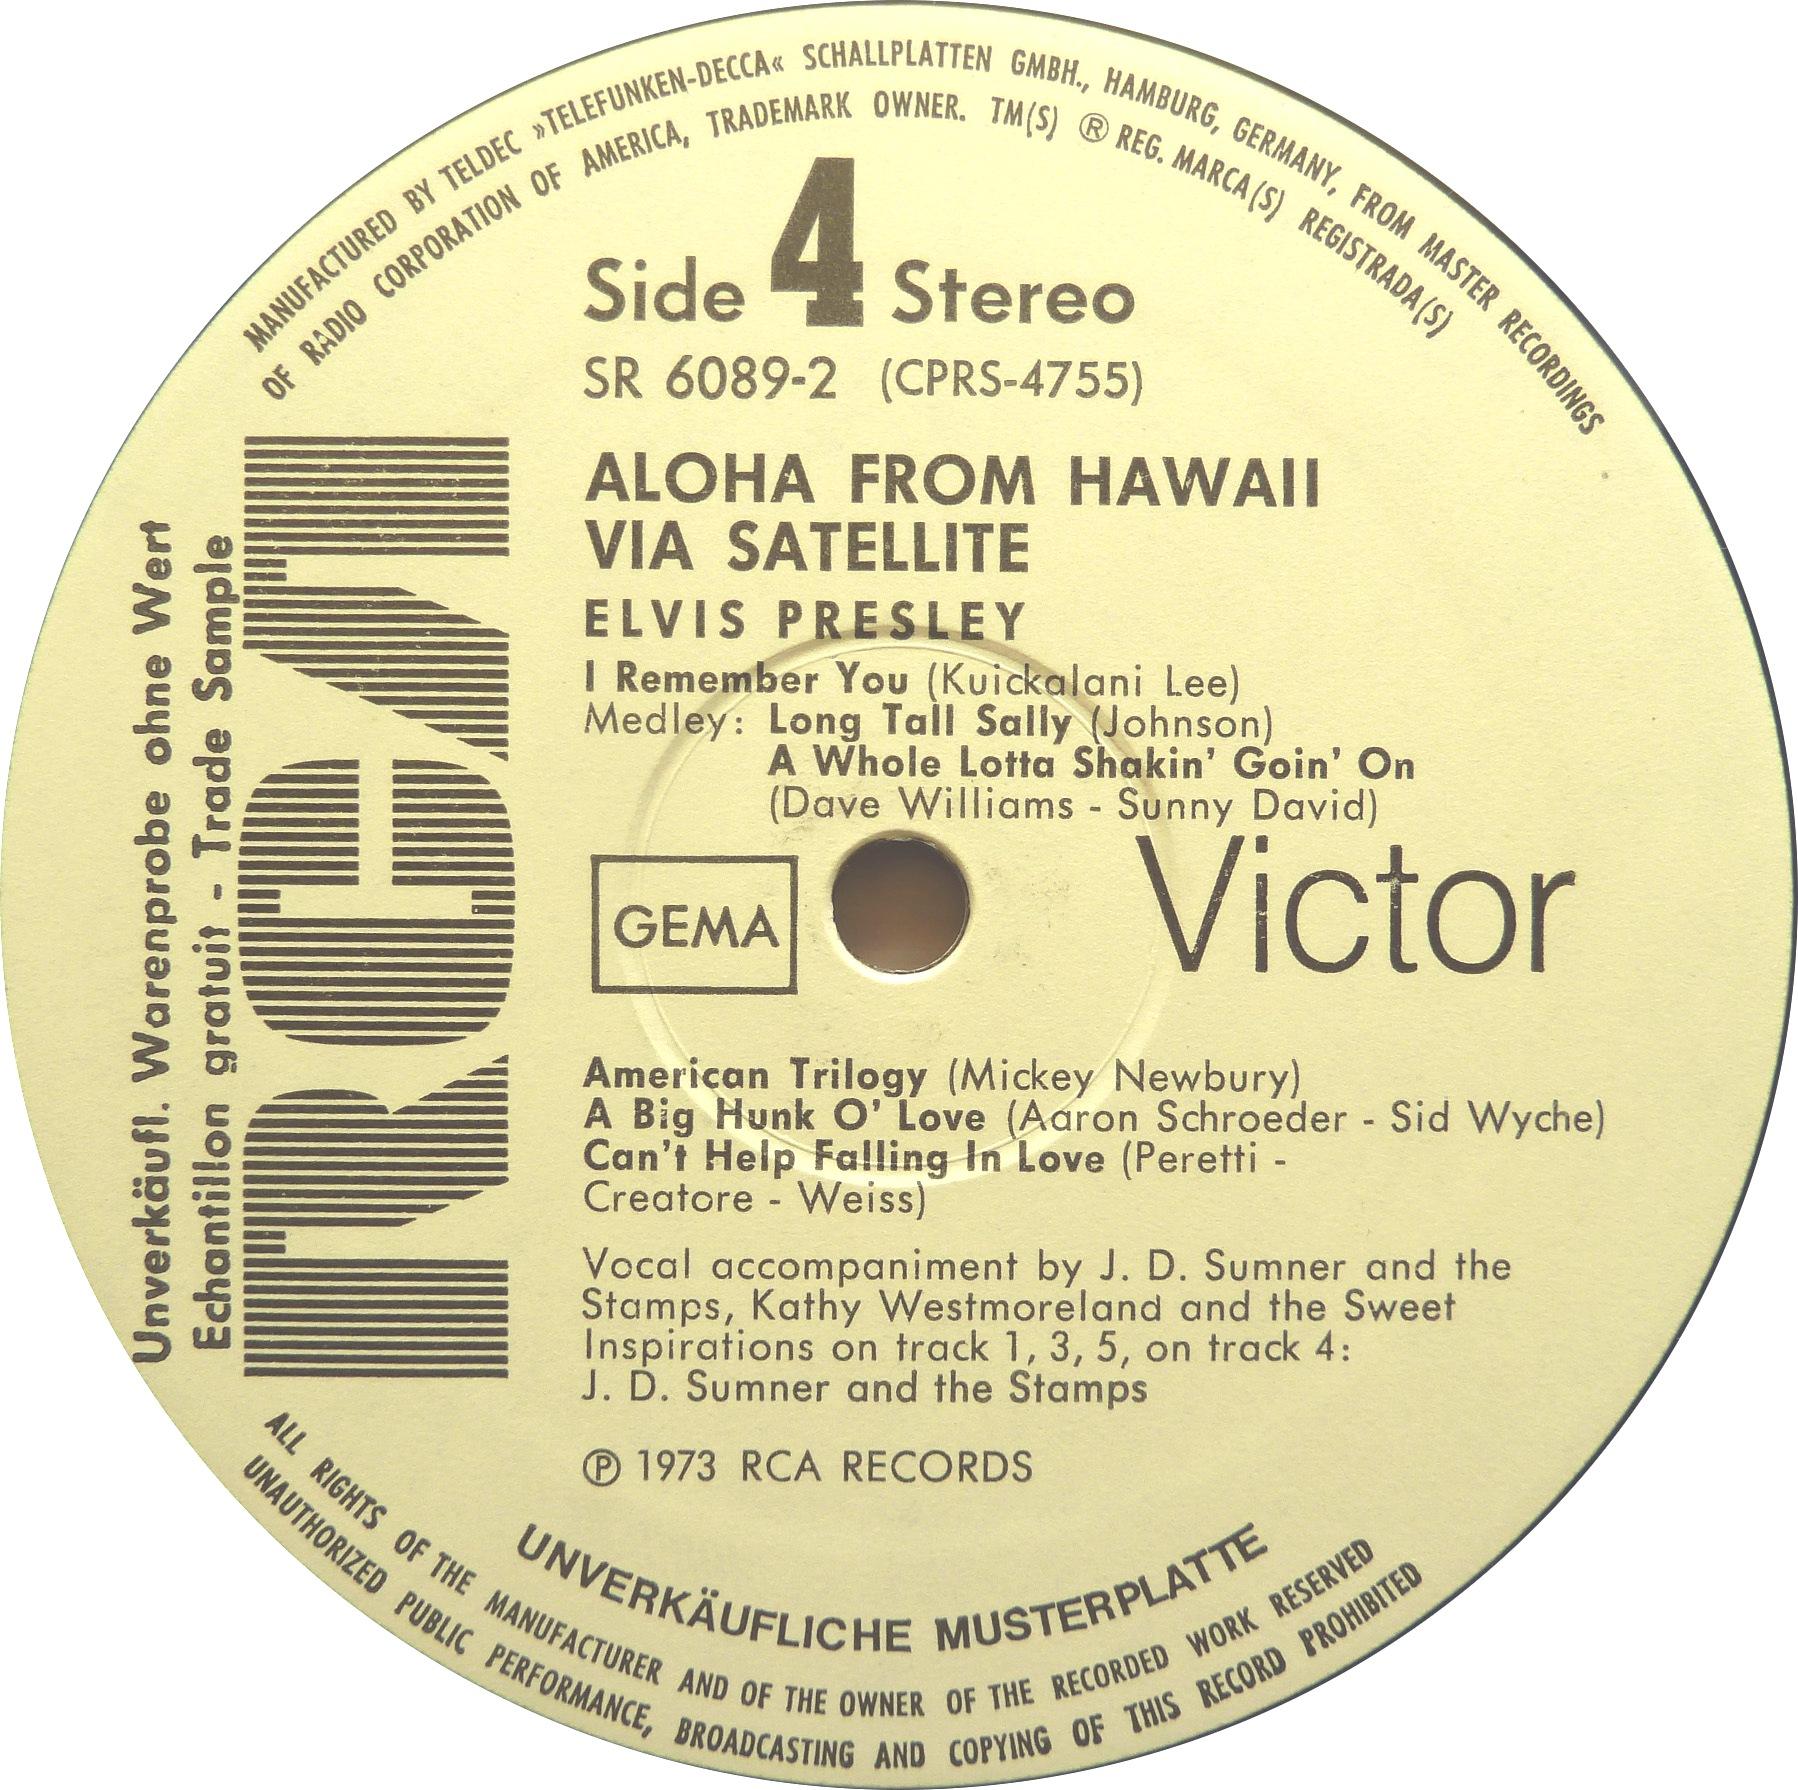 ALOHA FROM HAWAII VIA SATELLITE  Afh73promoside4ibksn